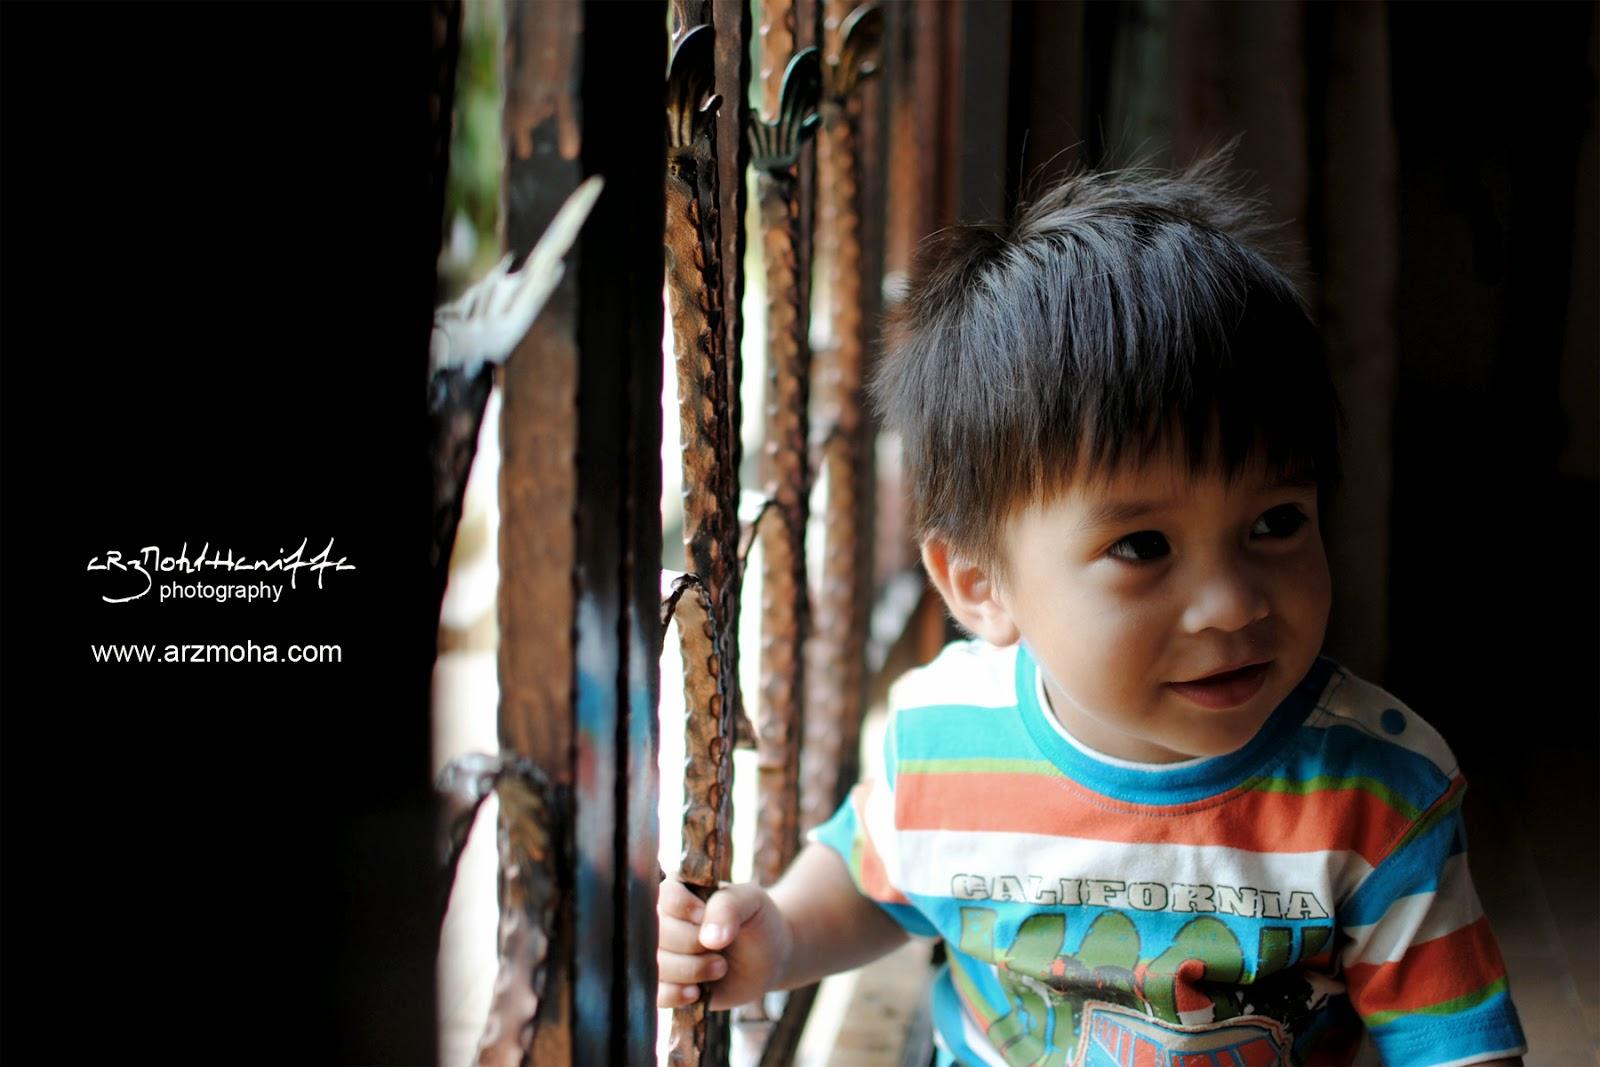 Kids, kanak-kanak, boy, kids world, gambar cantik, kids photography